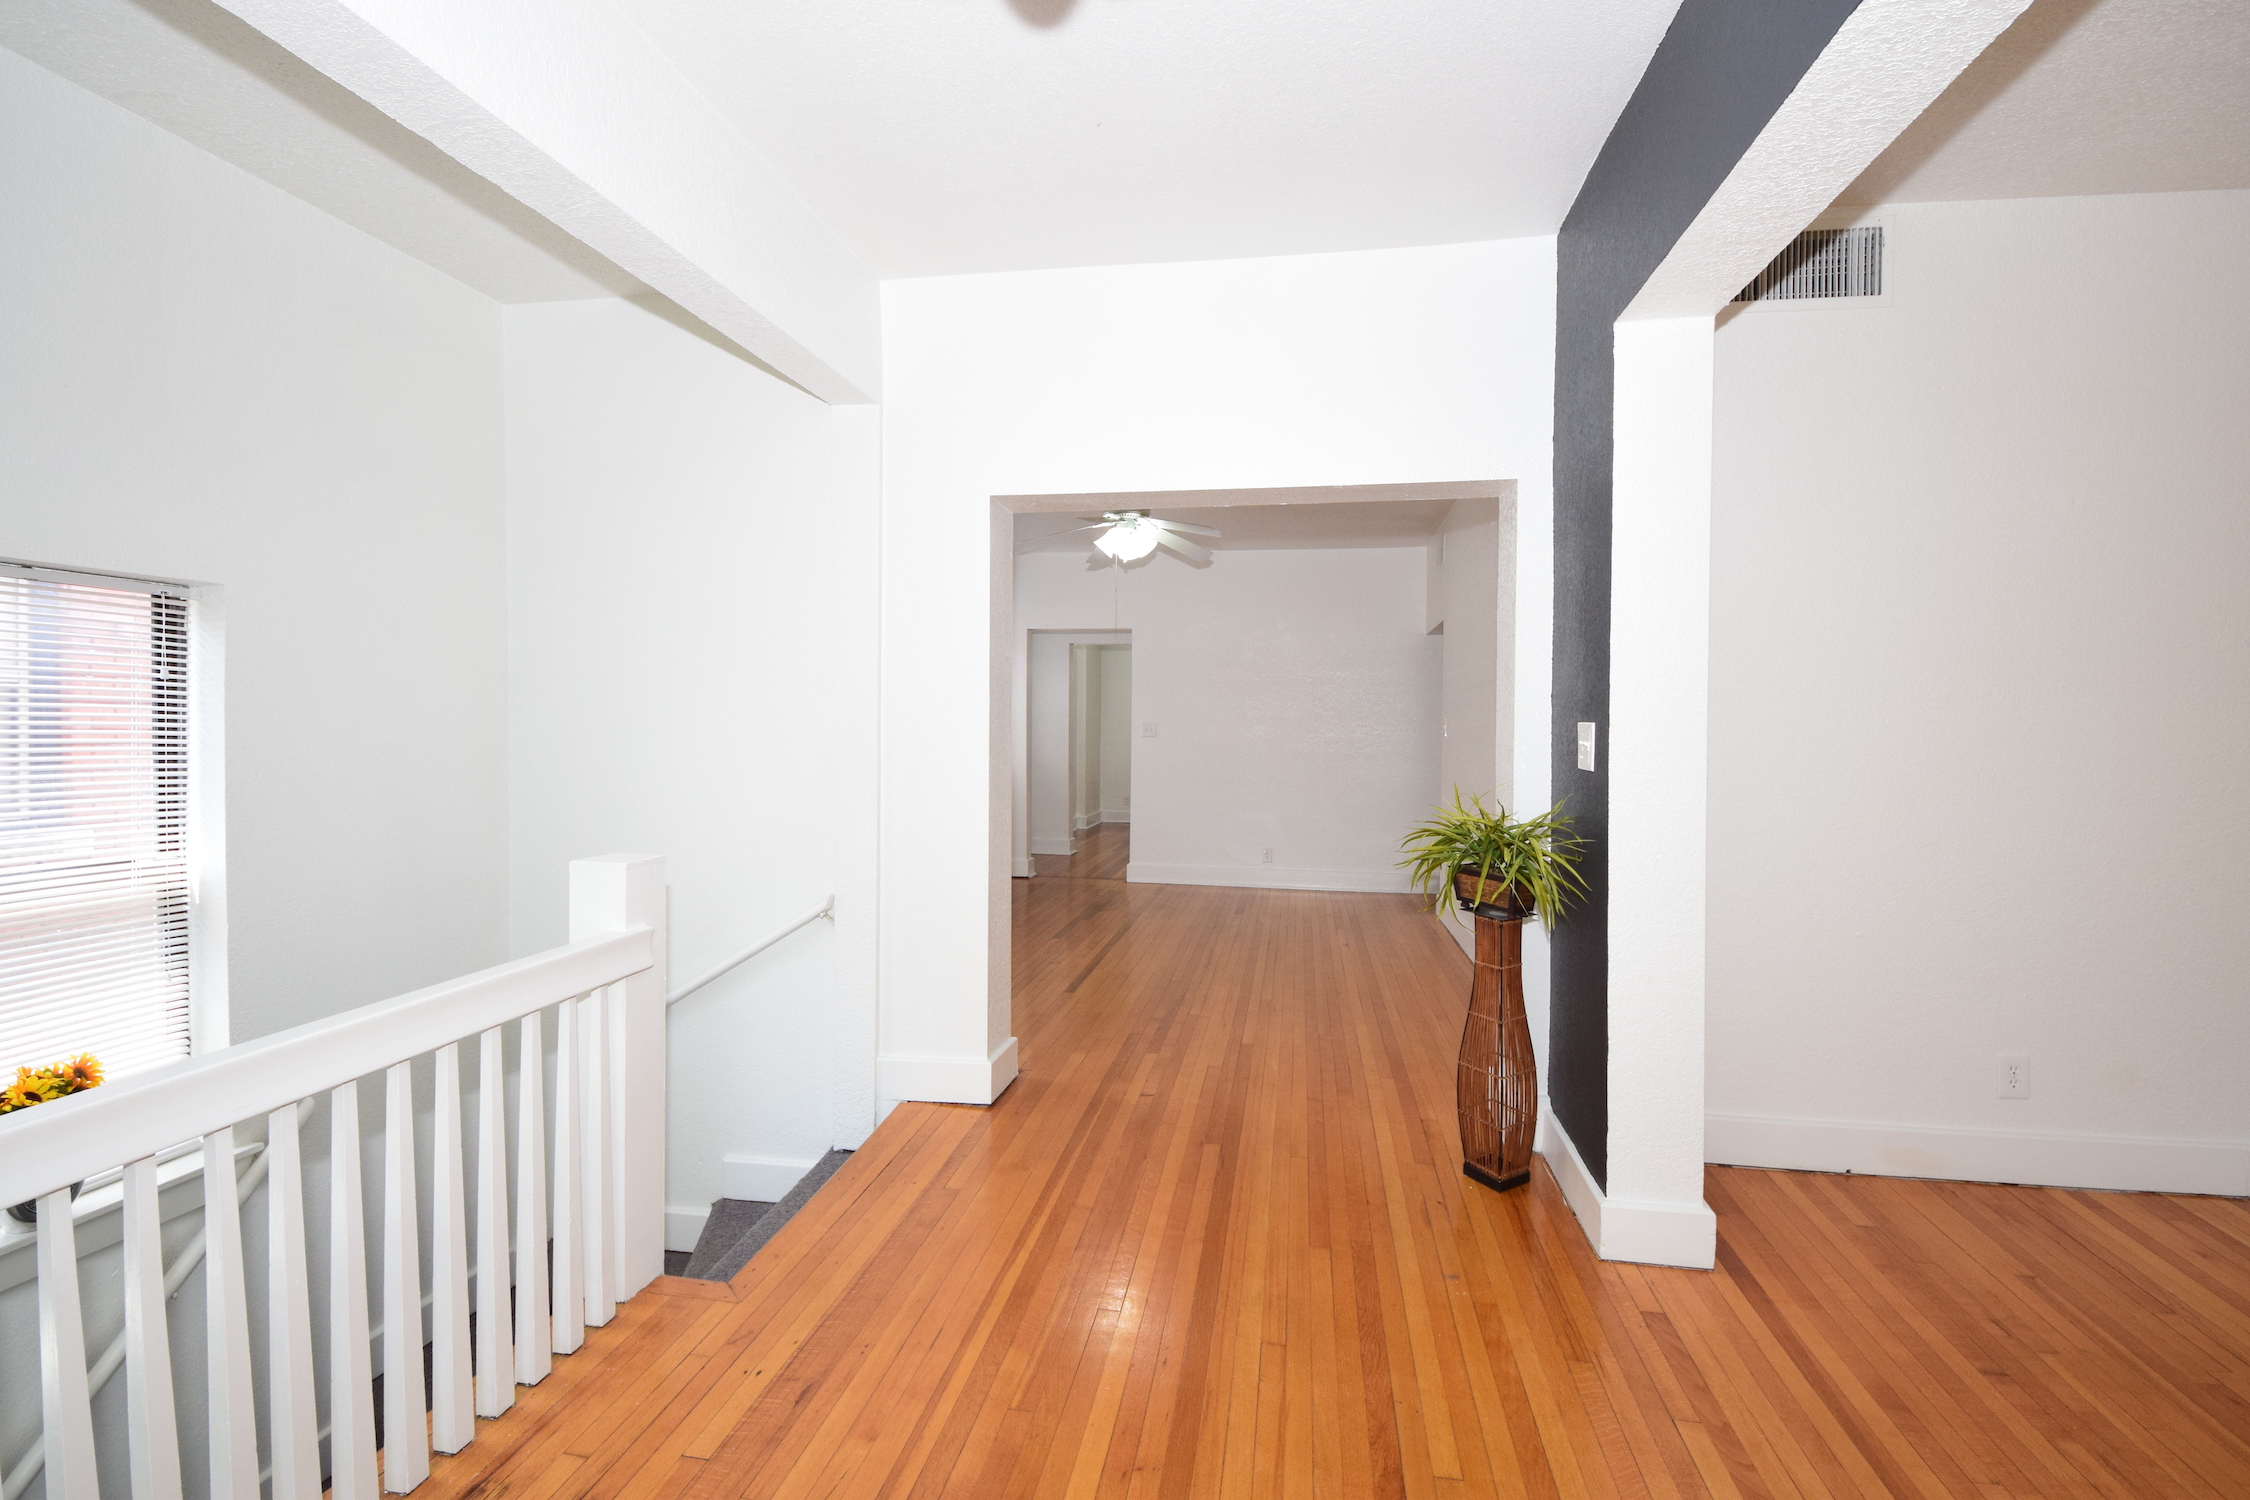 Foyer 7.5' x 14.3'